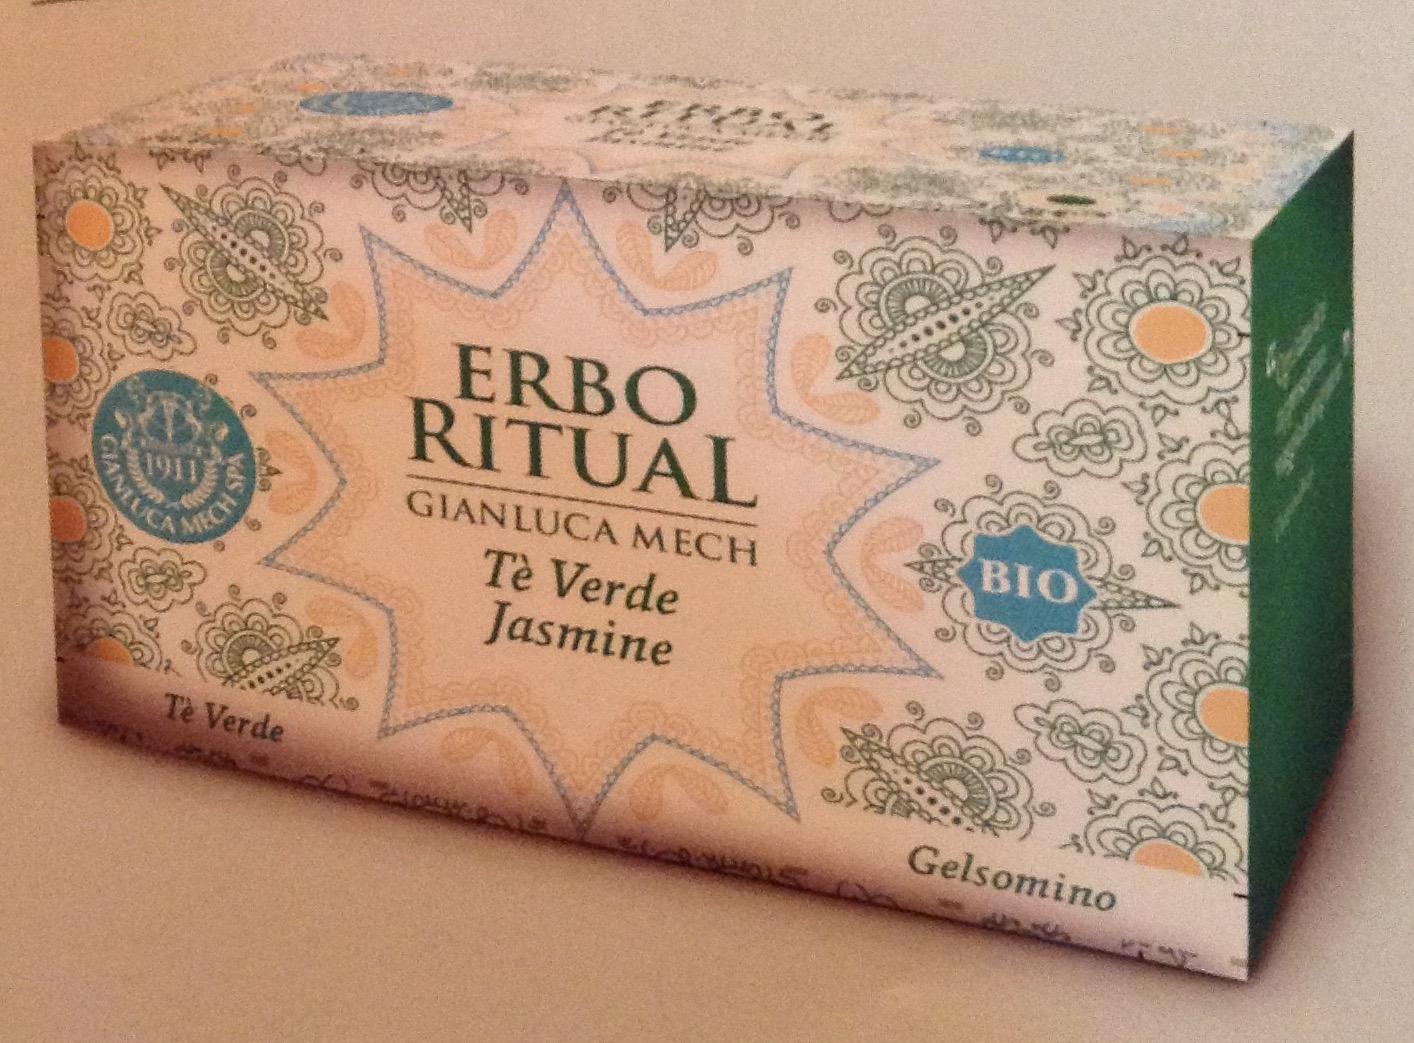 Erbo Ritual Te' Verde Jasmine